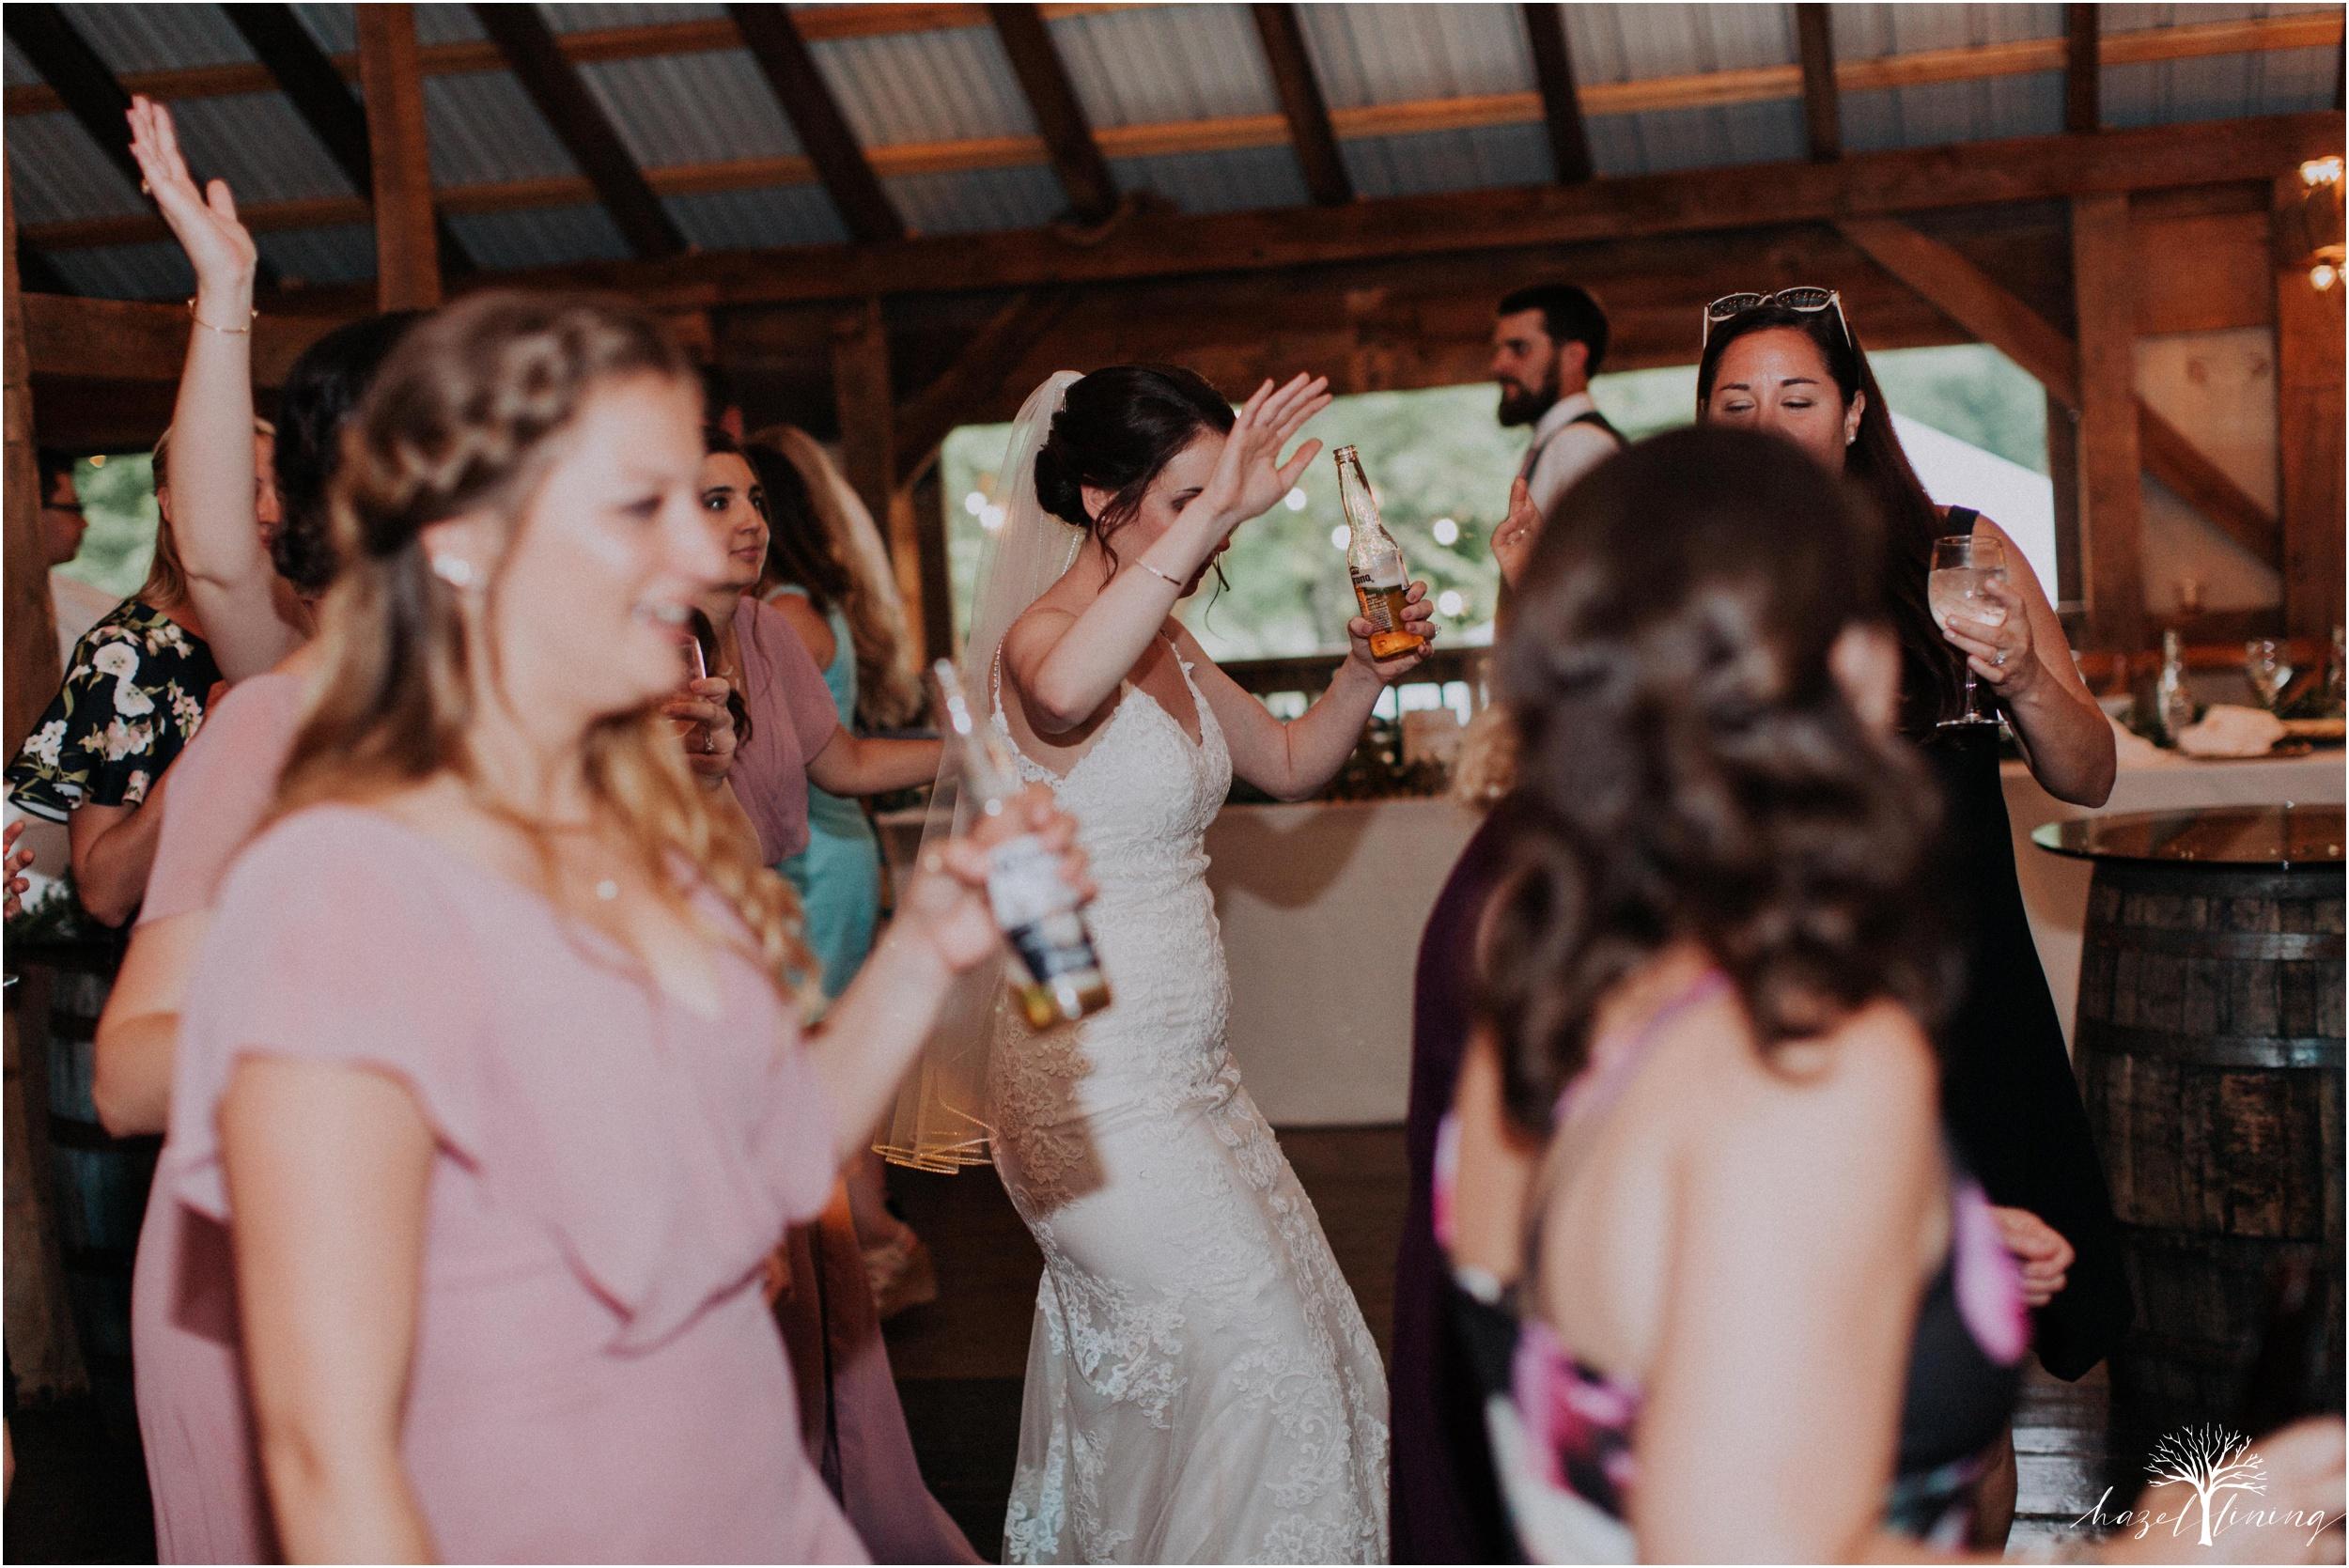 hazel-lining-travel-wedding-elopement-photography-lisa-landon-shoemaker-the-farm-bakery-and-events-bucks-county-quakertown-pennsylvania-summer-country-outdoor-farm-wedding_0148.jpg